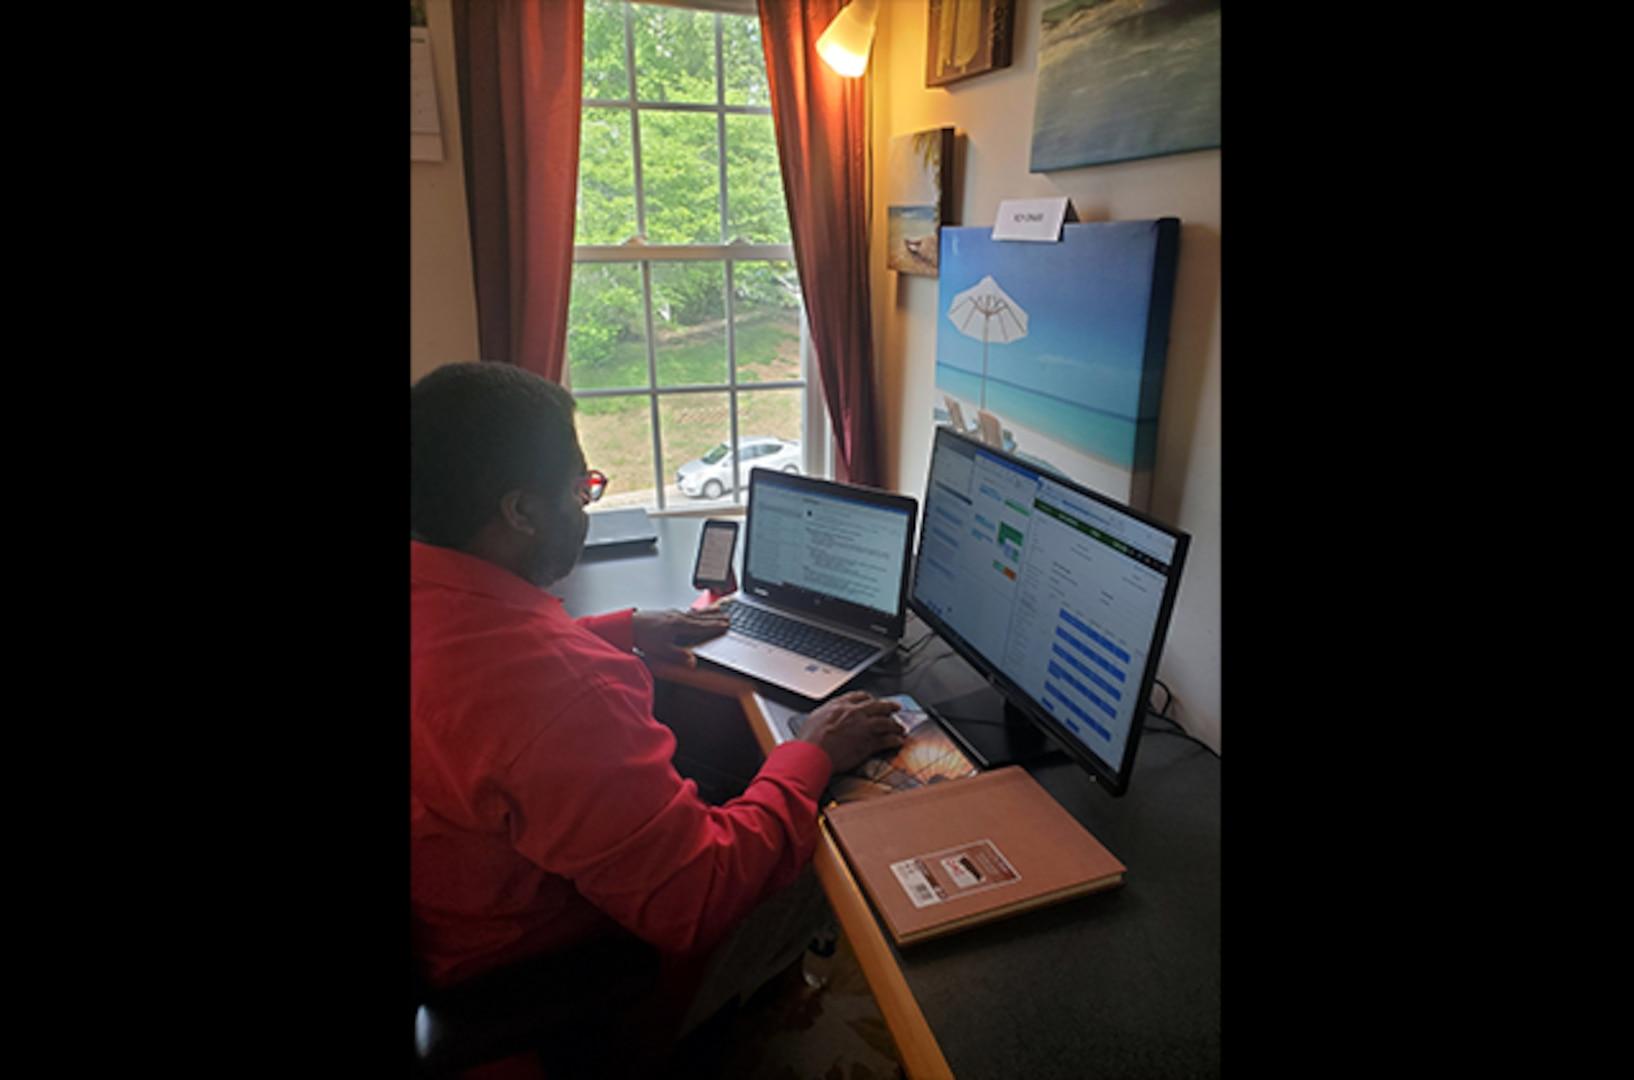 DLA Aviation leader communicates with staff